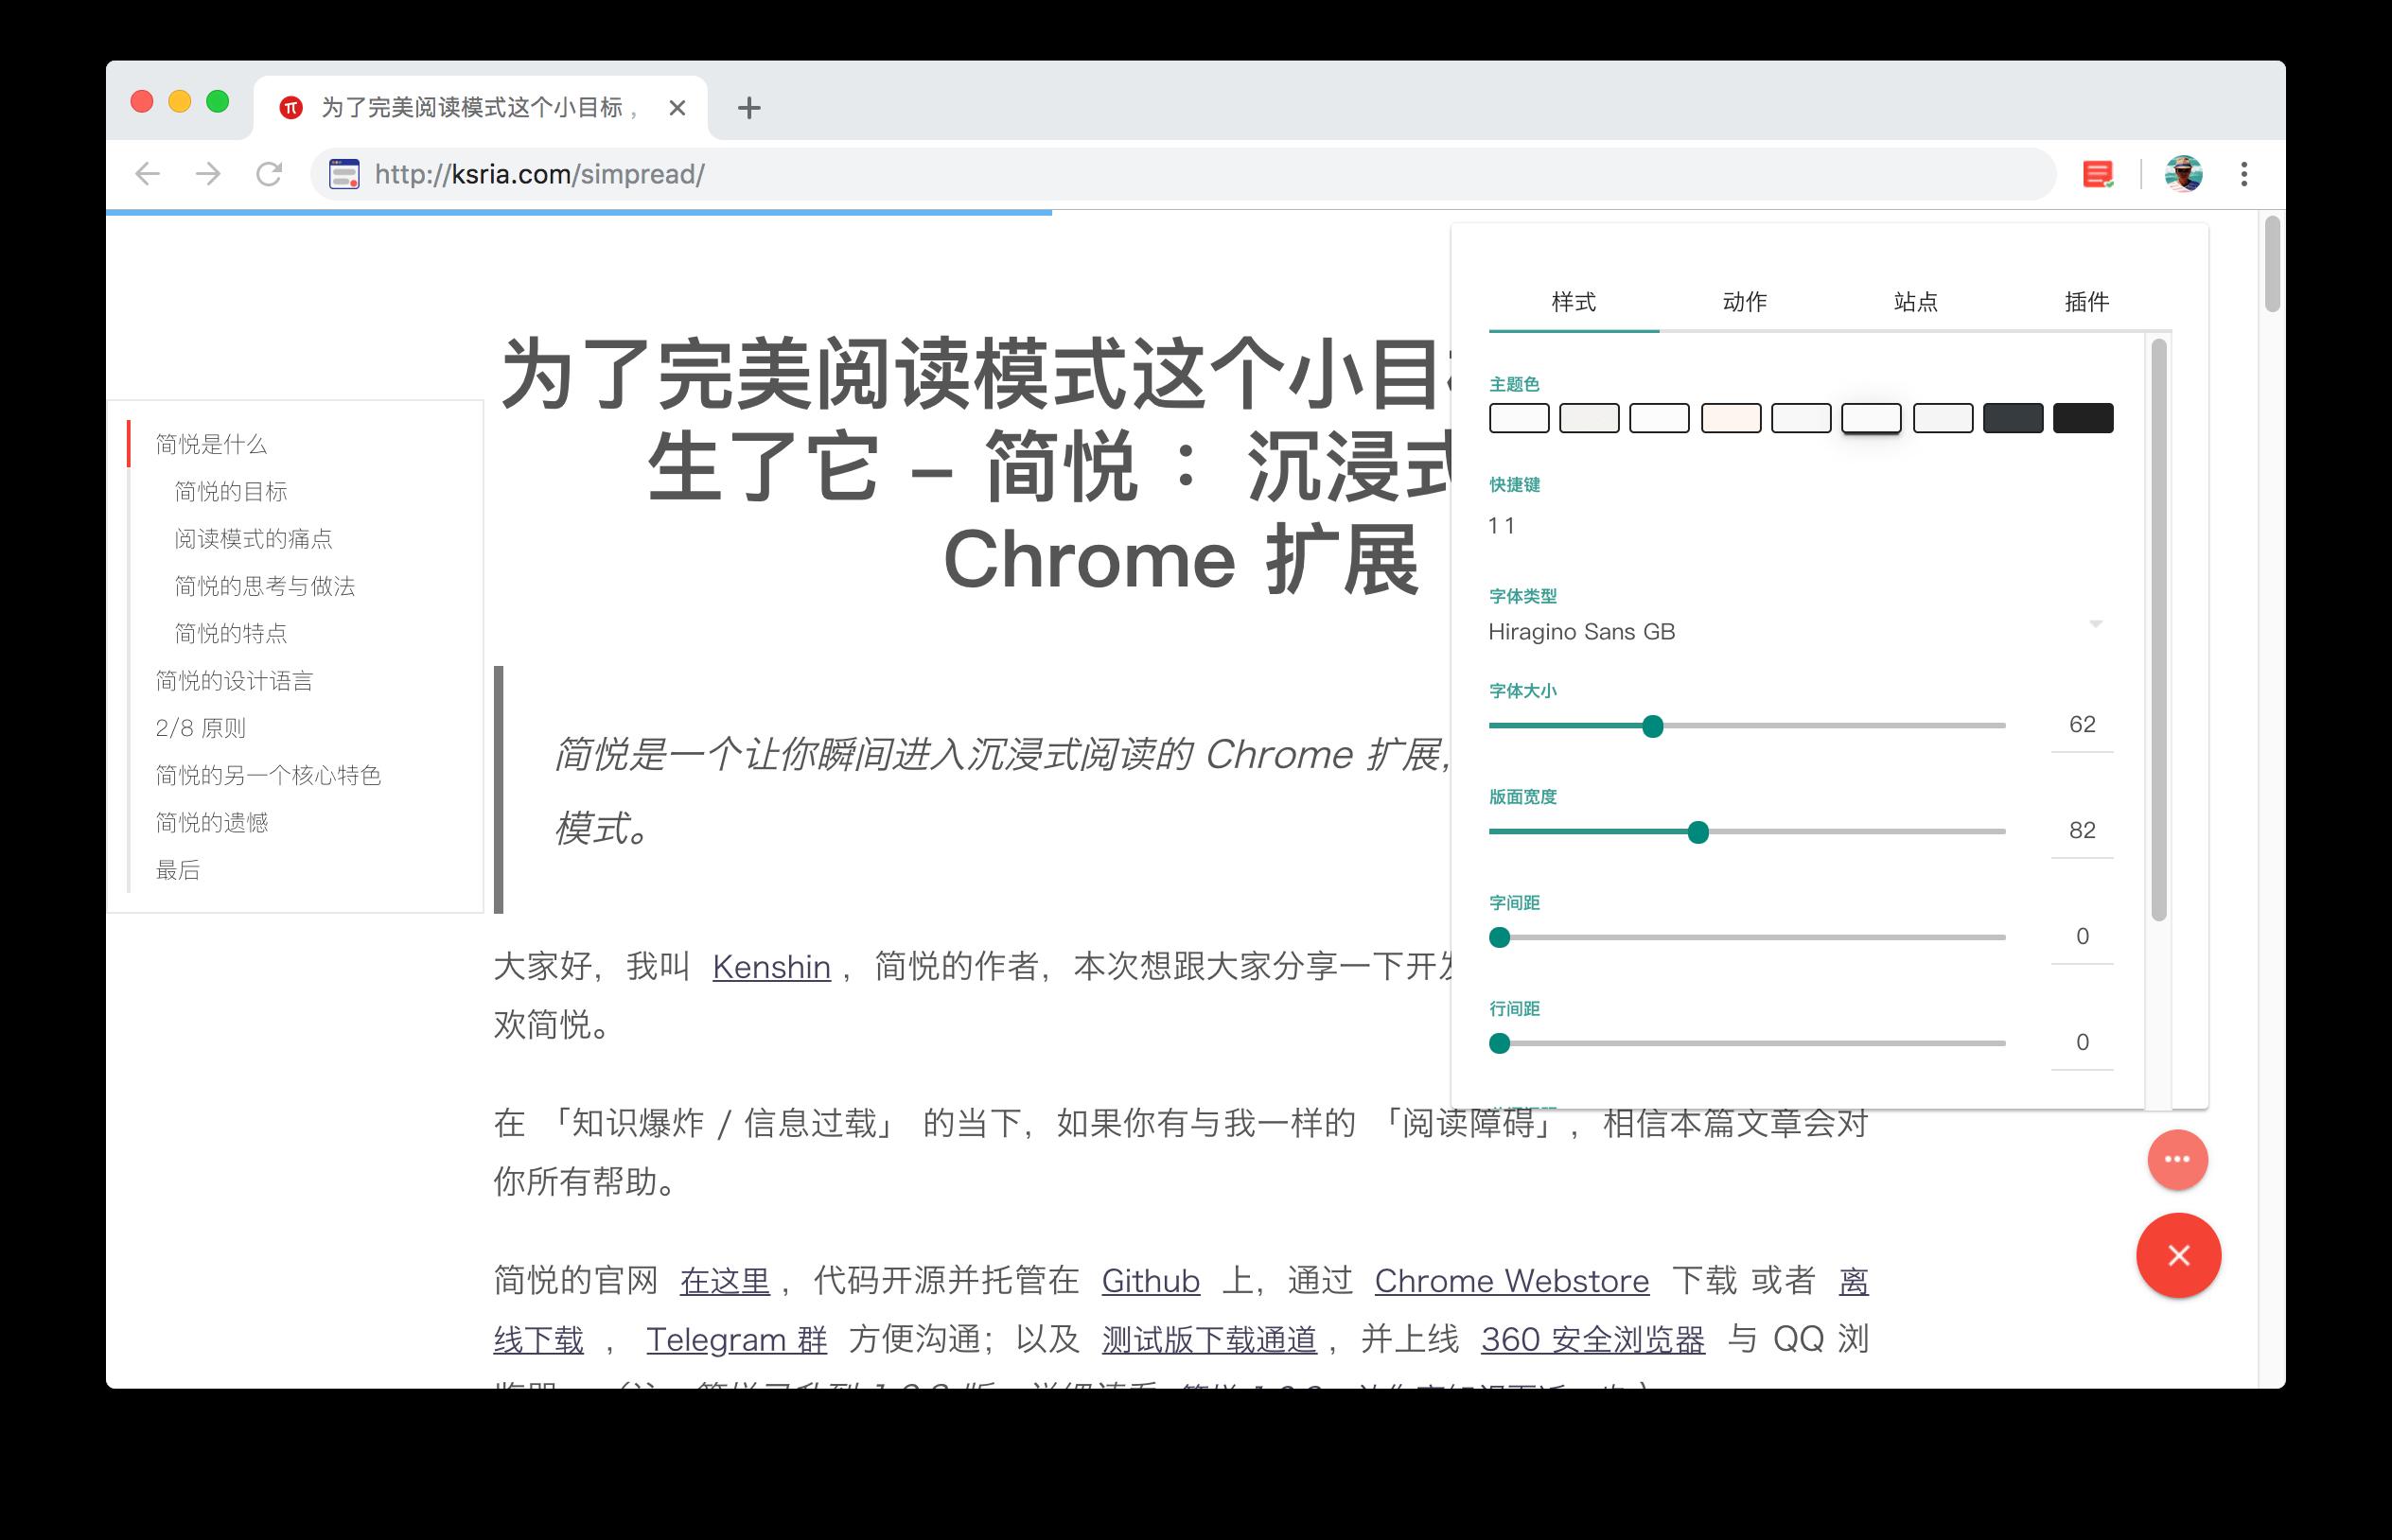 http://ksria.com/simpread/guide/assets/images/readmodecontrol.png